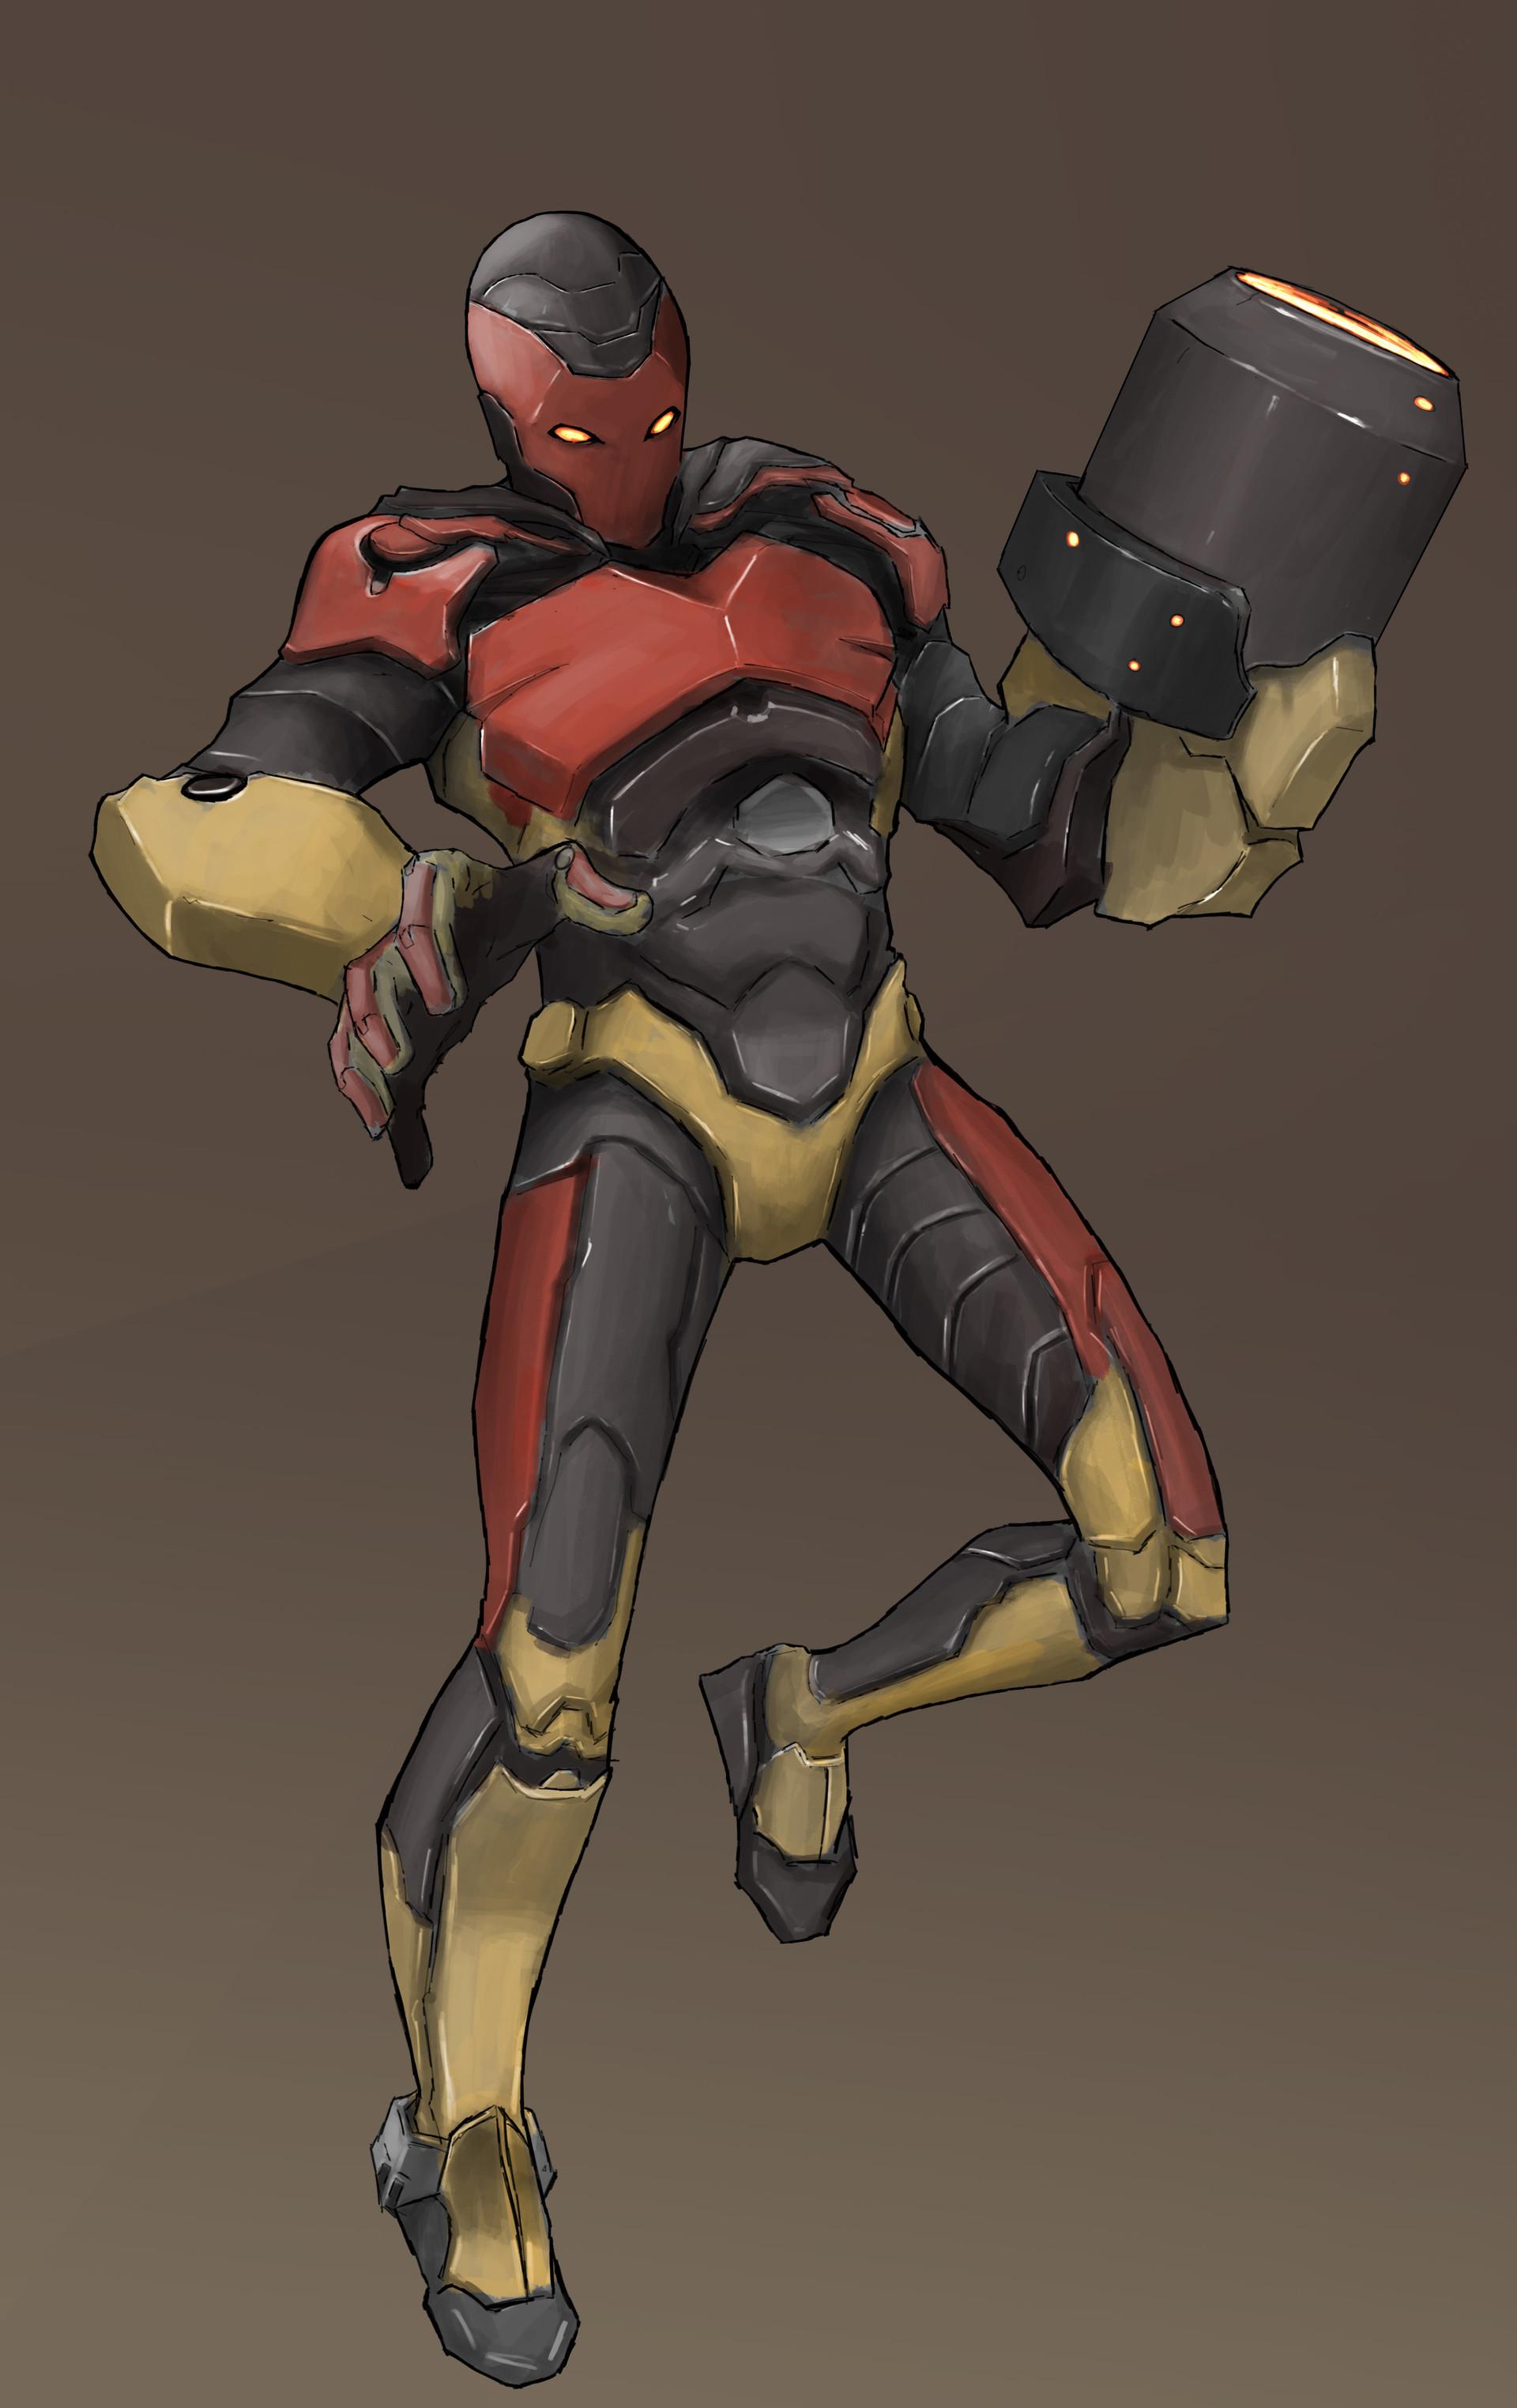 Gbenle maverick cyborg 7 5